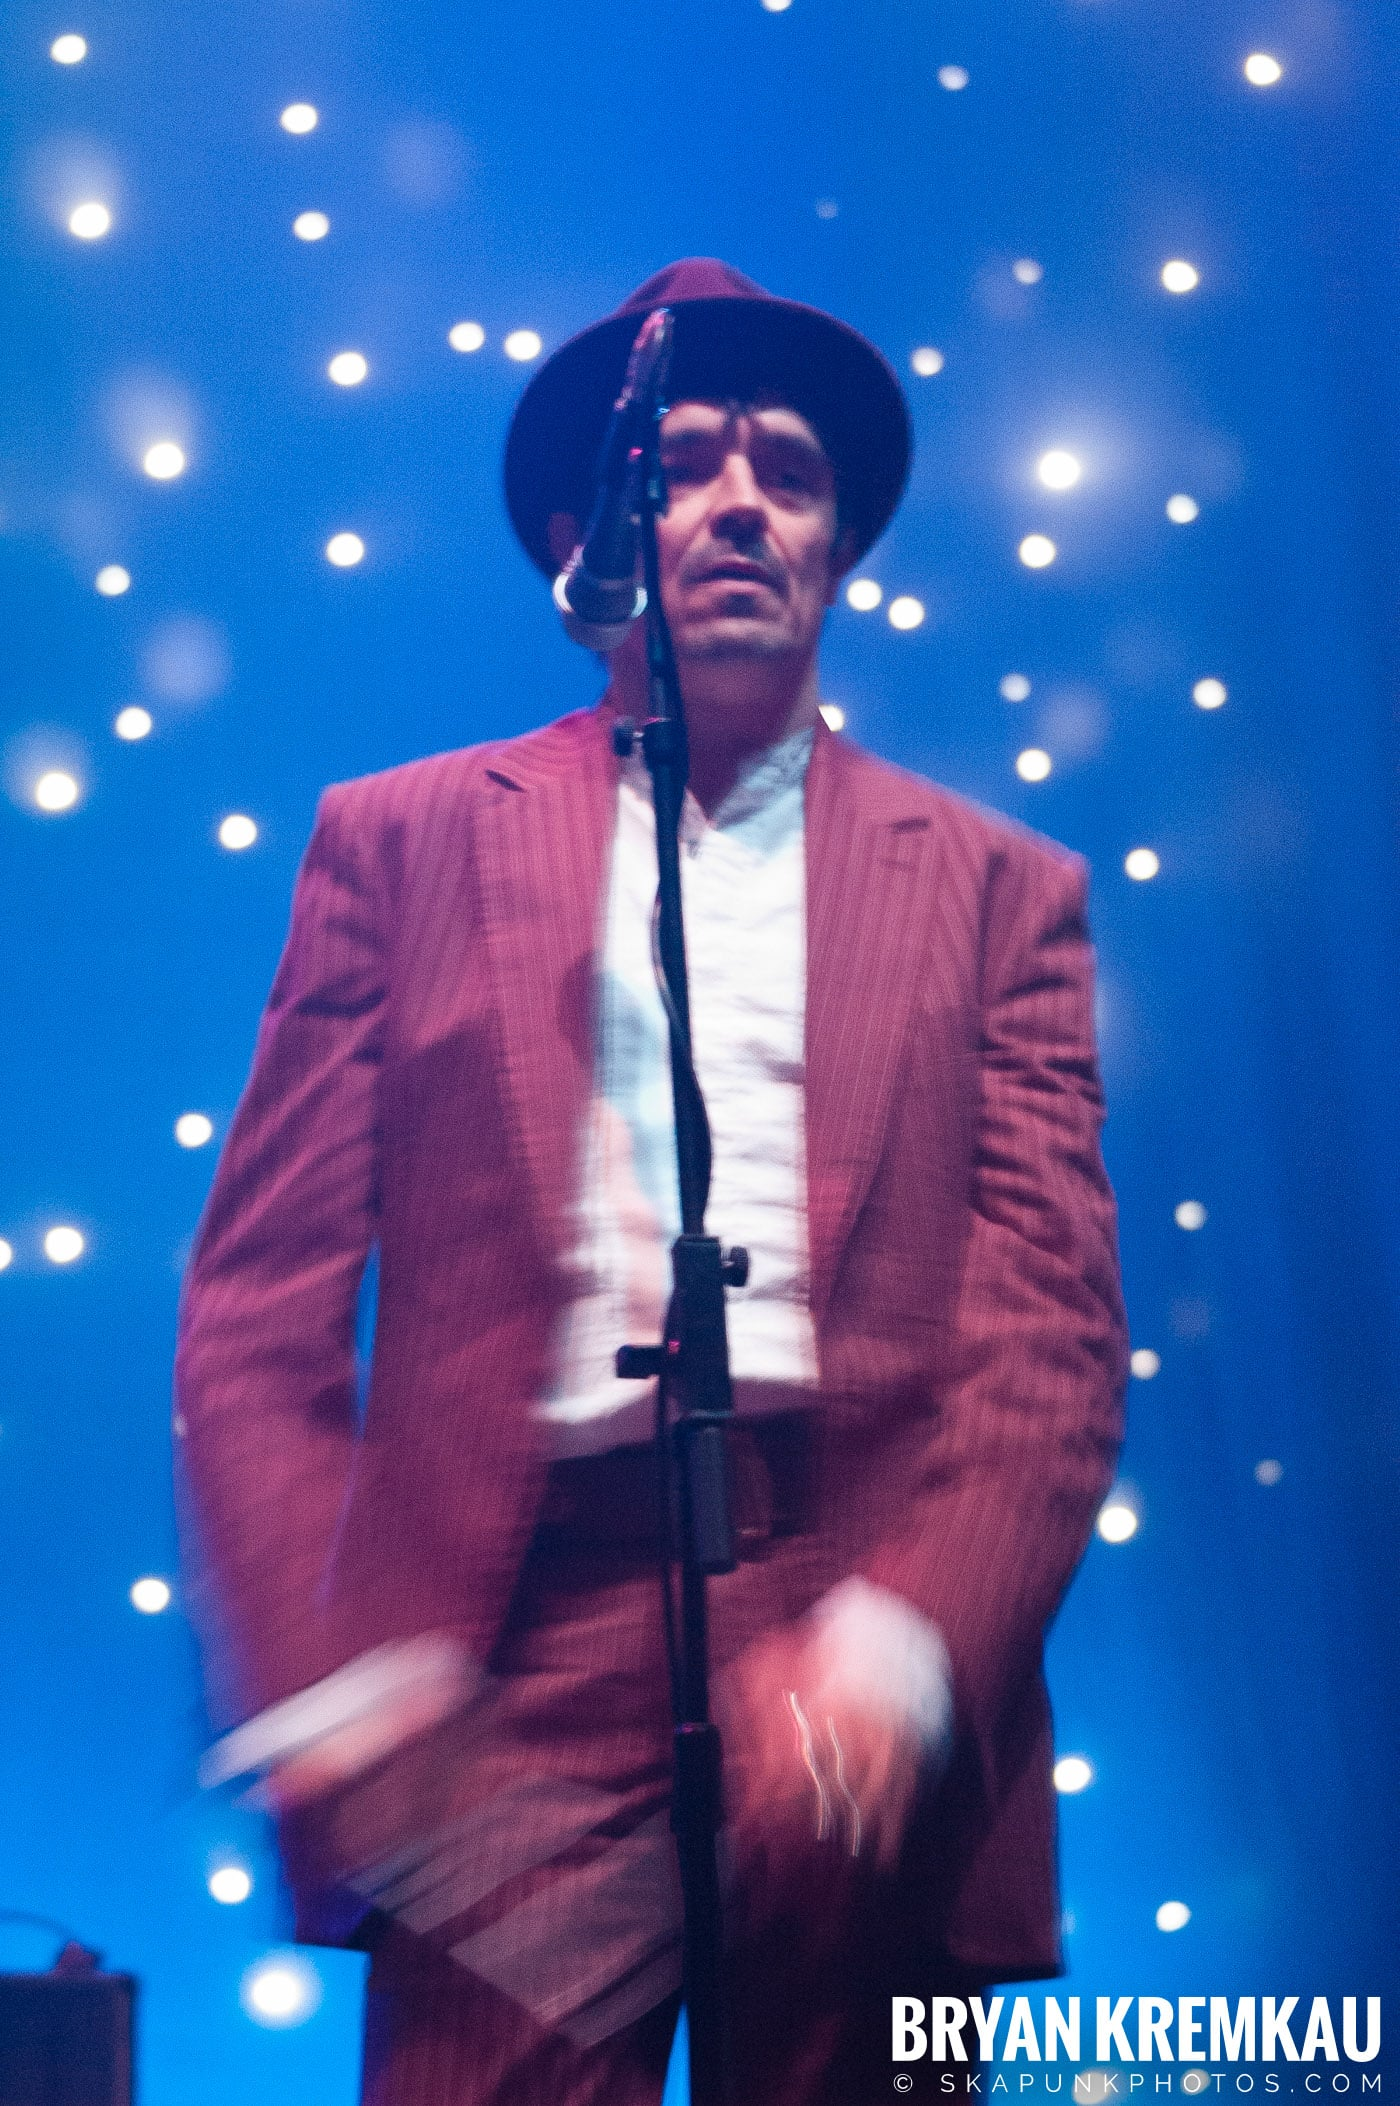 The Pogues @ Brixton Academy, London UK - 12.17.06 (11)